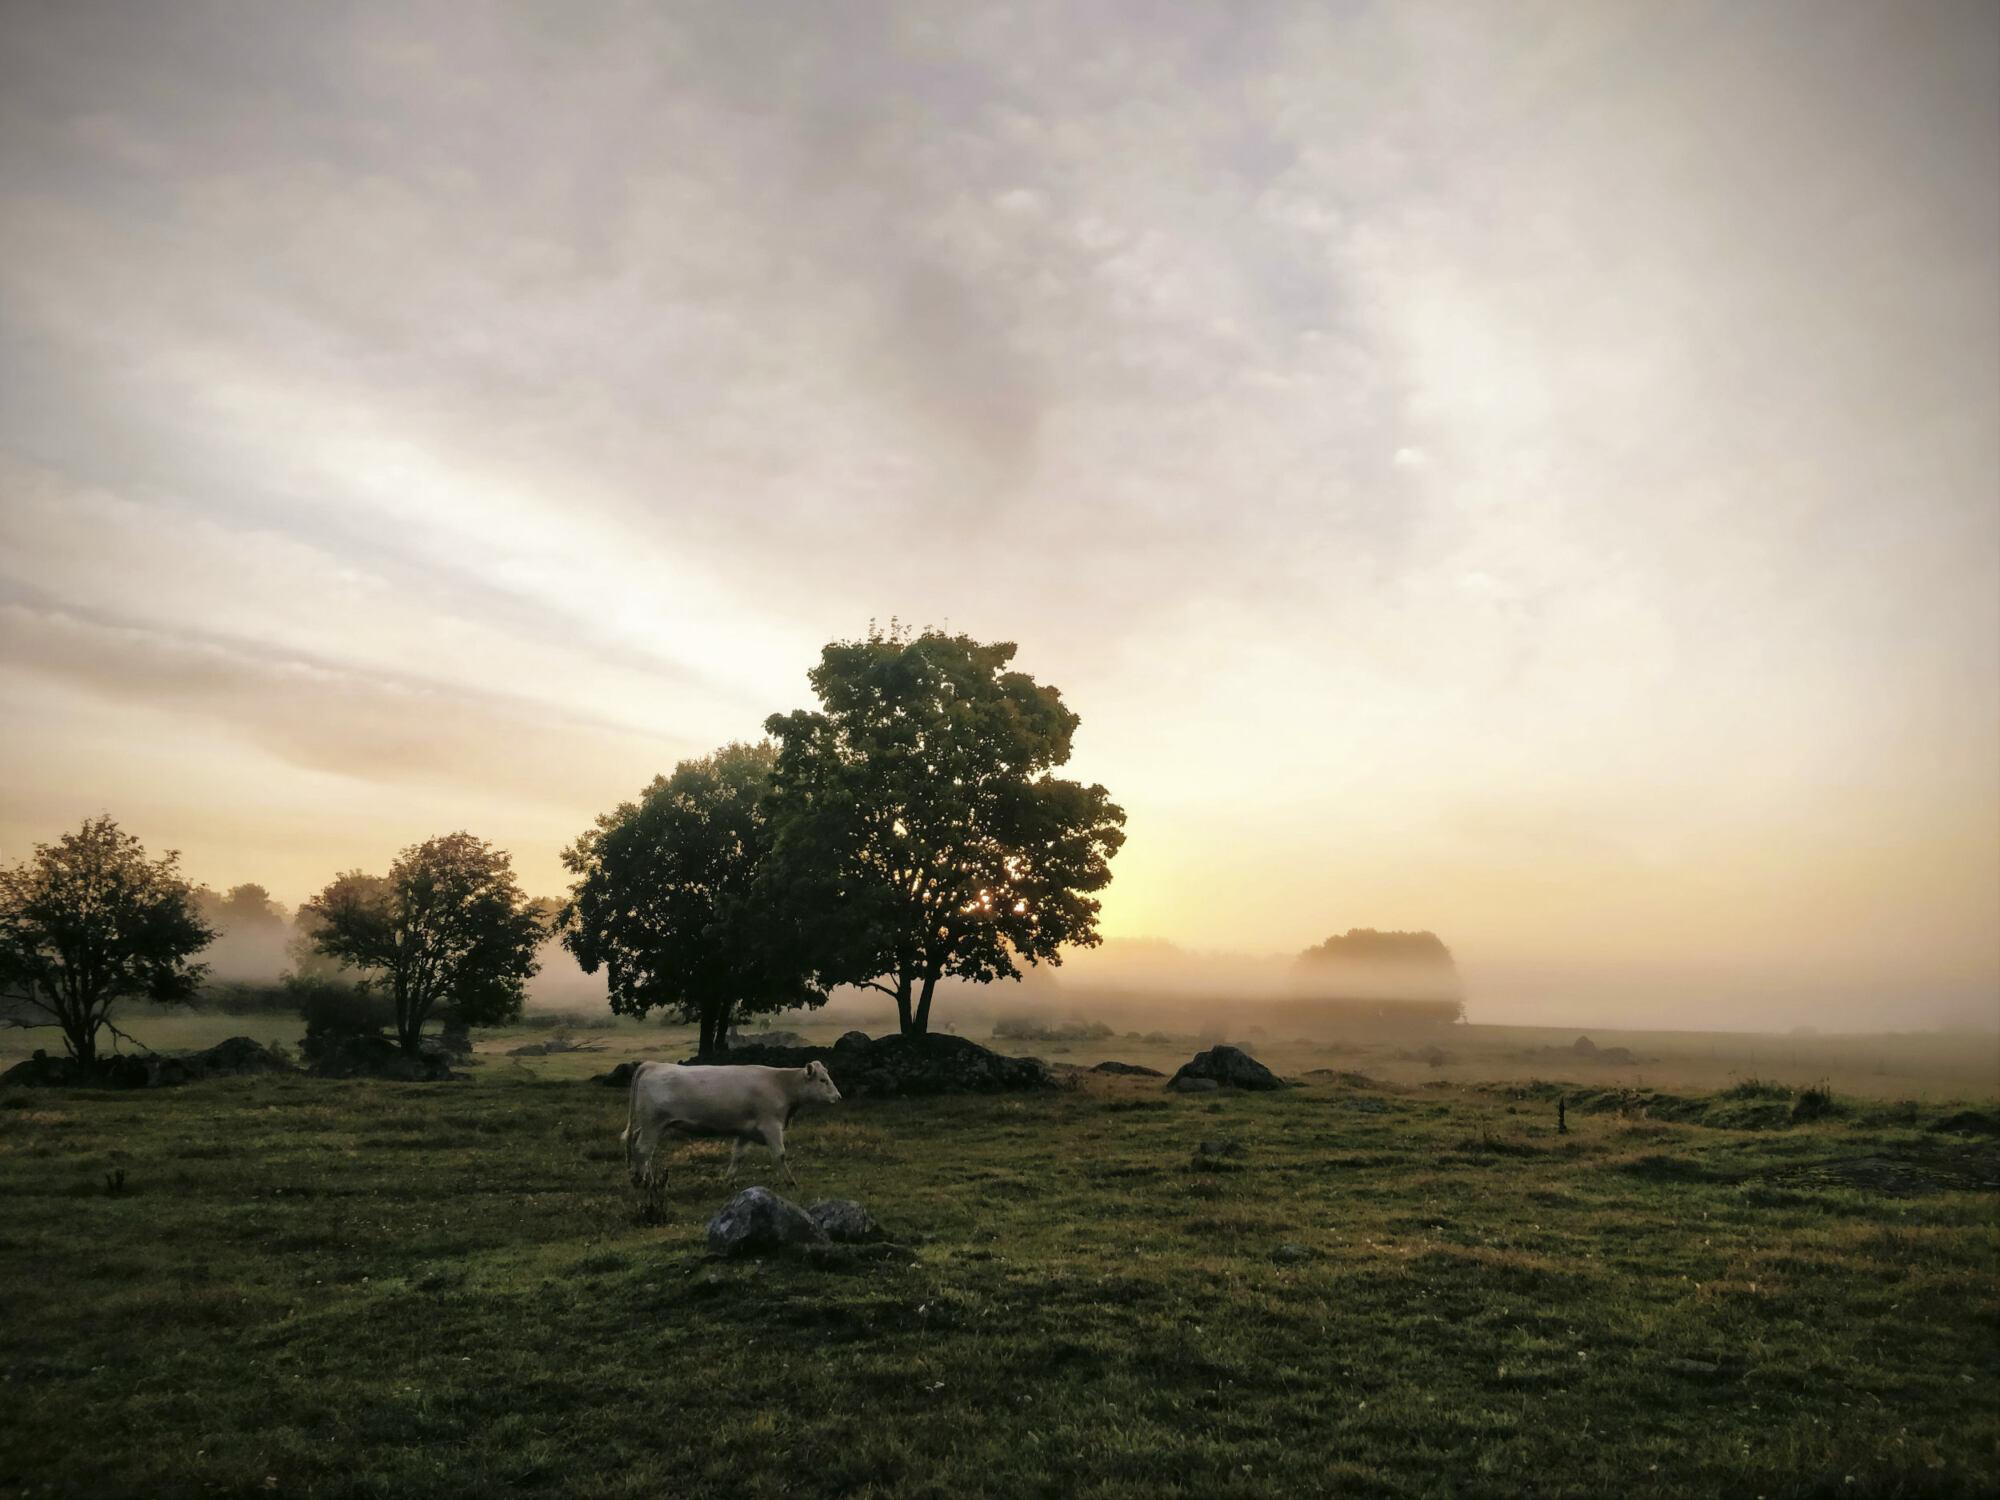 Ekbolanda farm magazine Fjärdhundraland